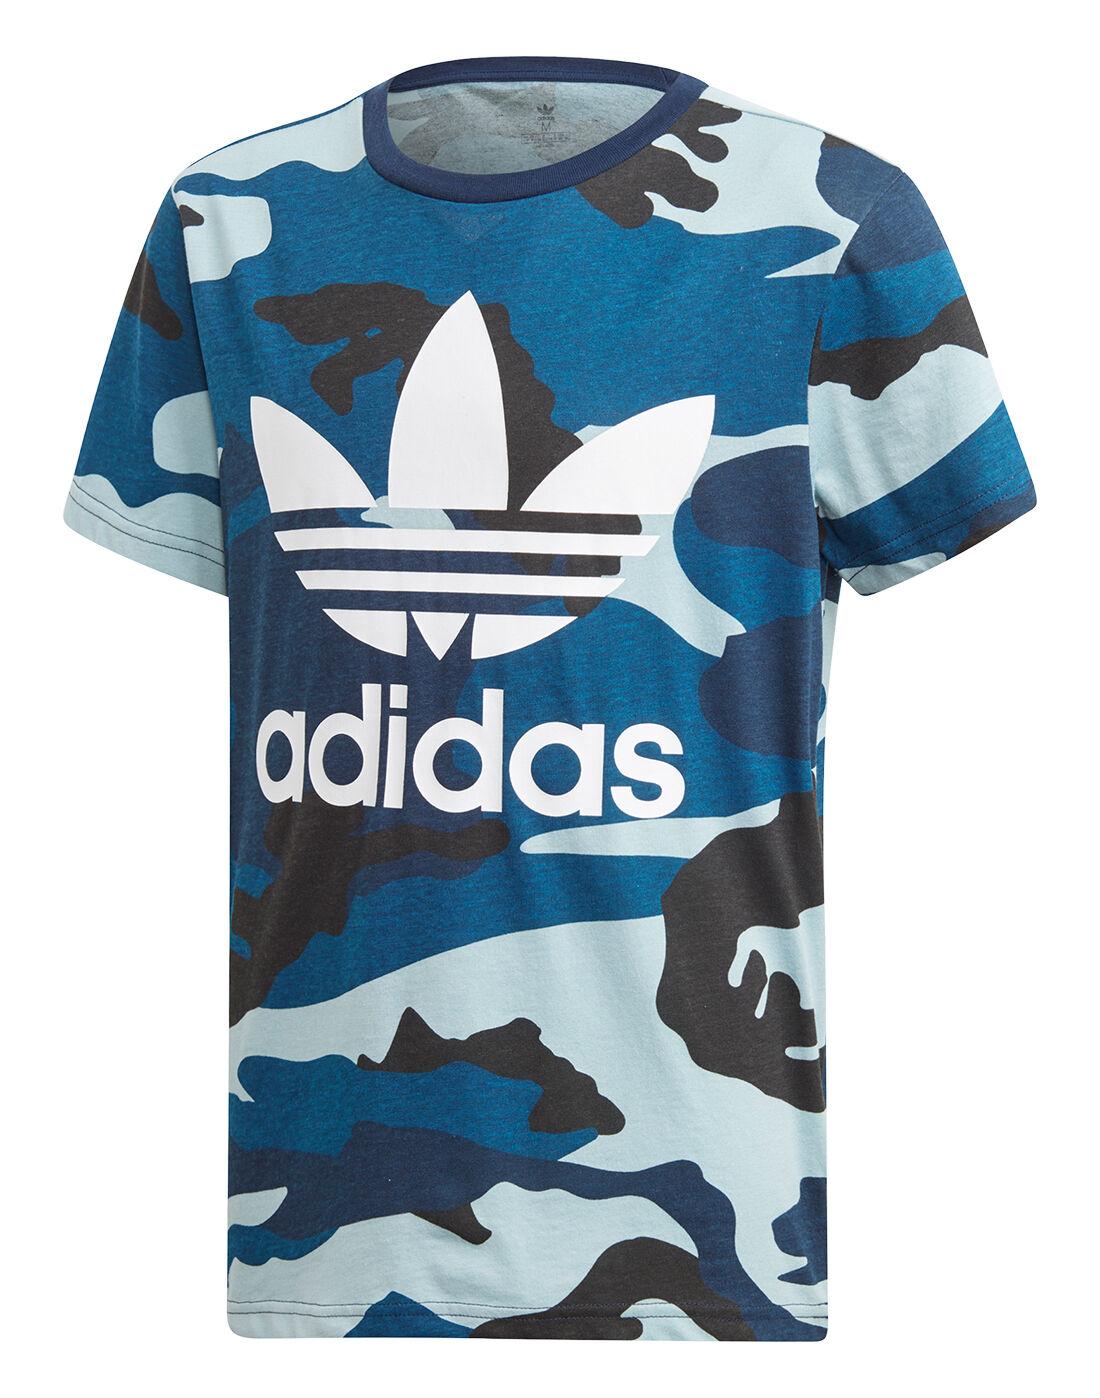 Kids Older Adidas Camo Shirt Originals T 3Lj54ARq